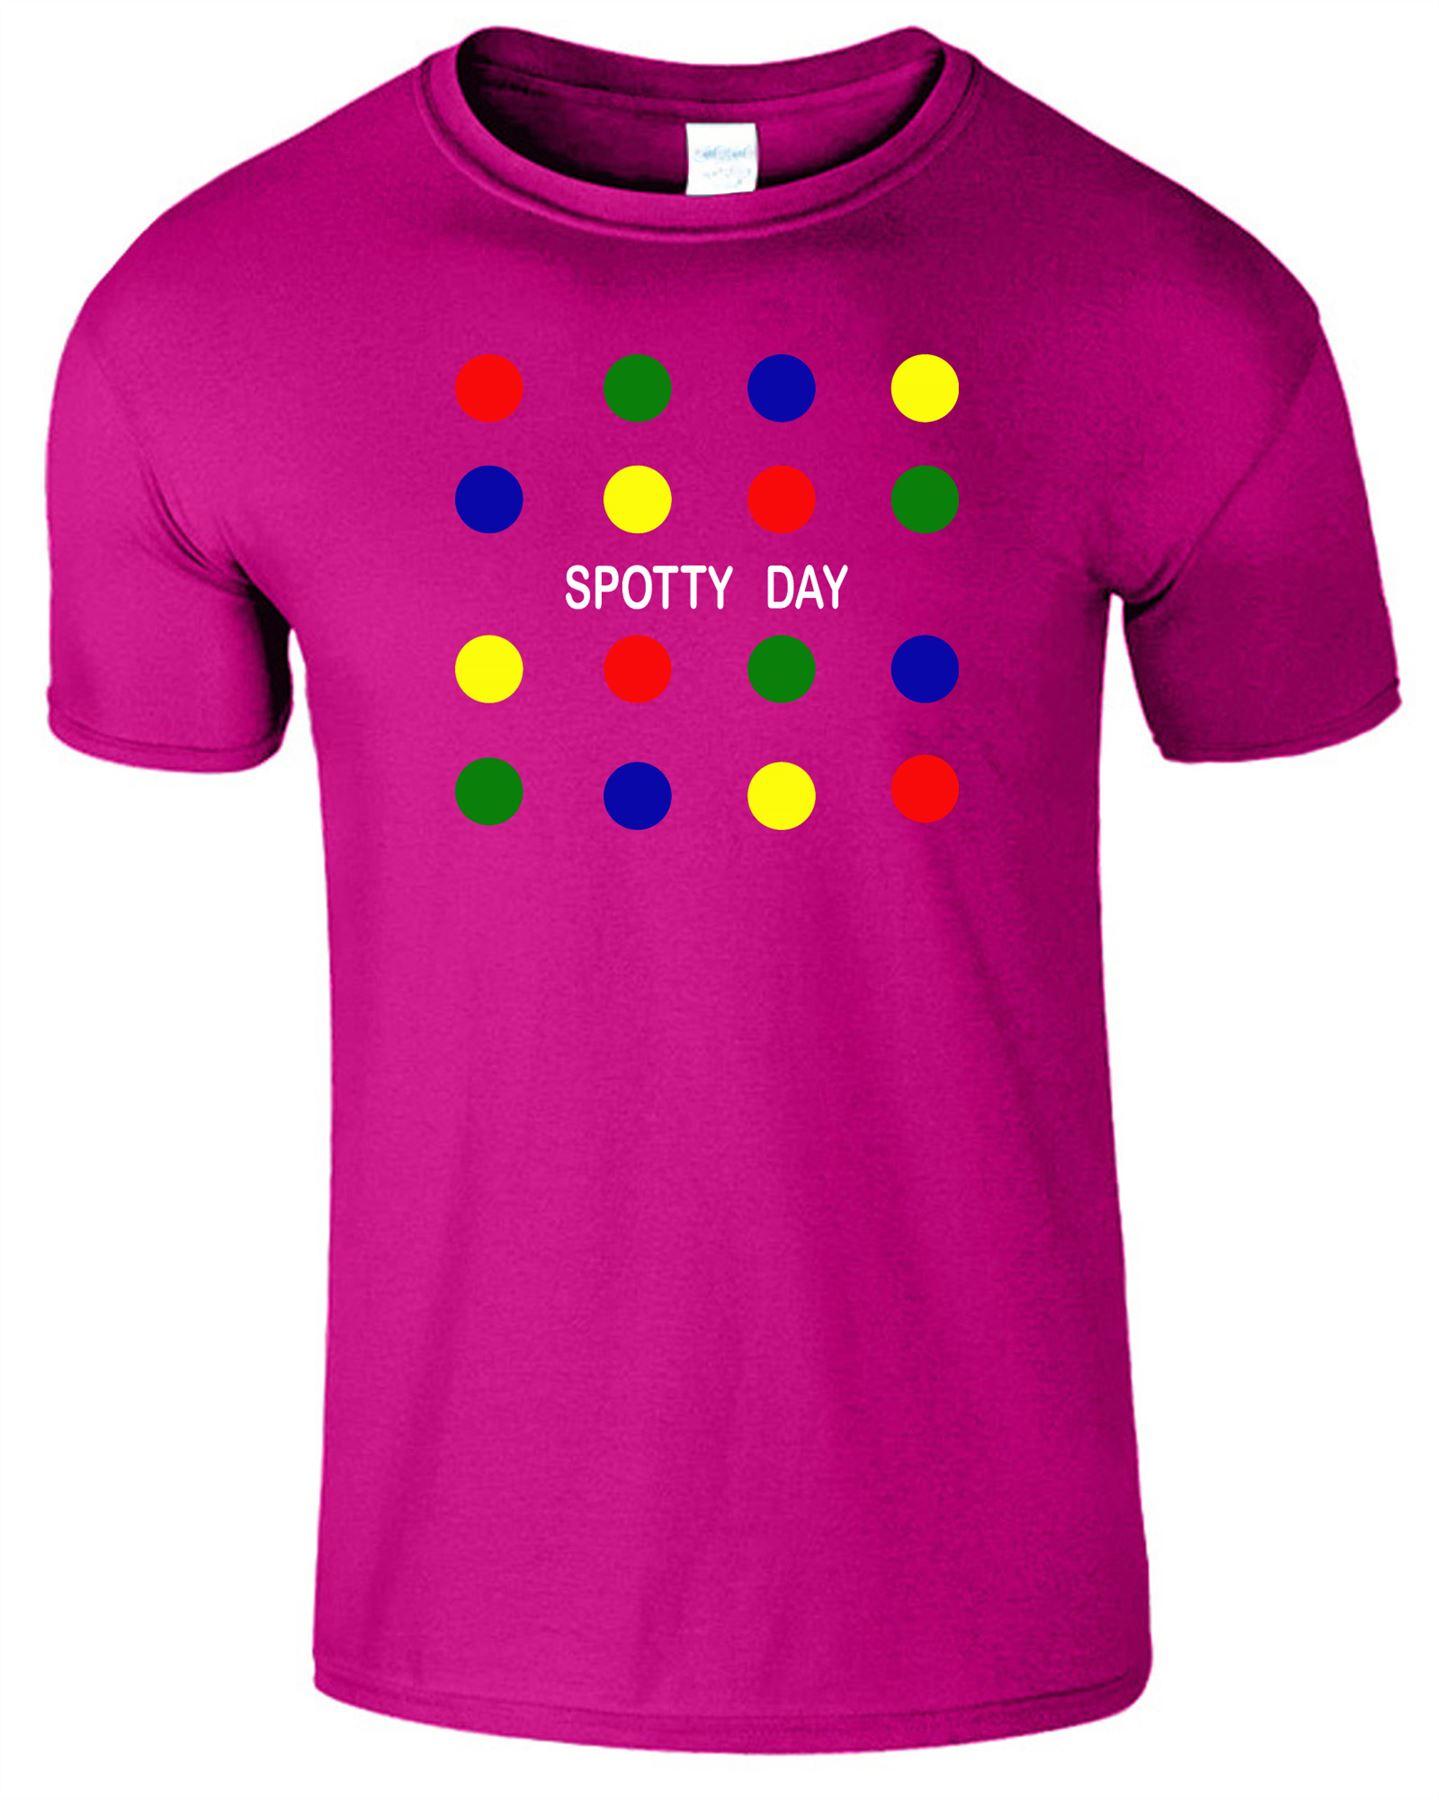 Kids Boys Girls Coloured Circles Logo T-Shirt Fancy Crew Neck Top Tee T Shirt